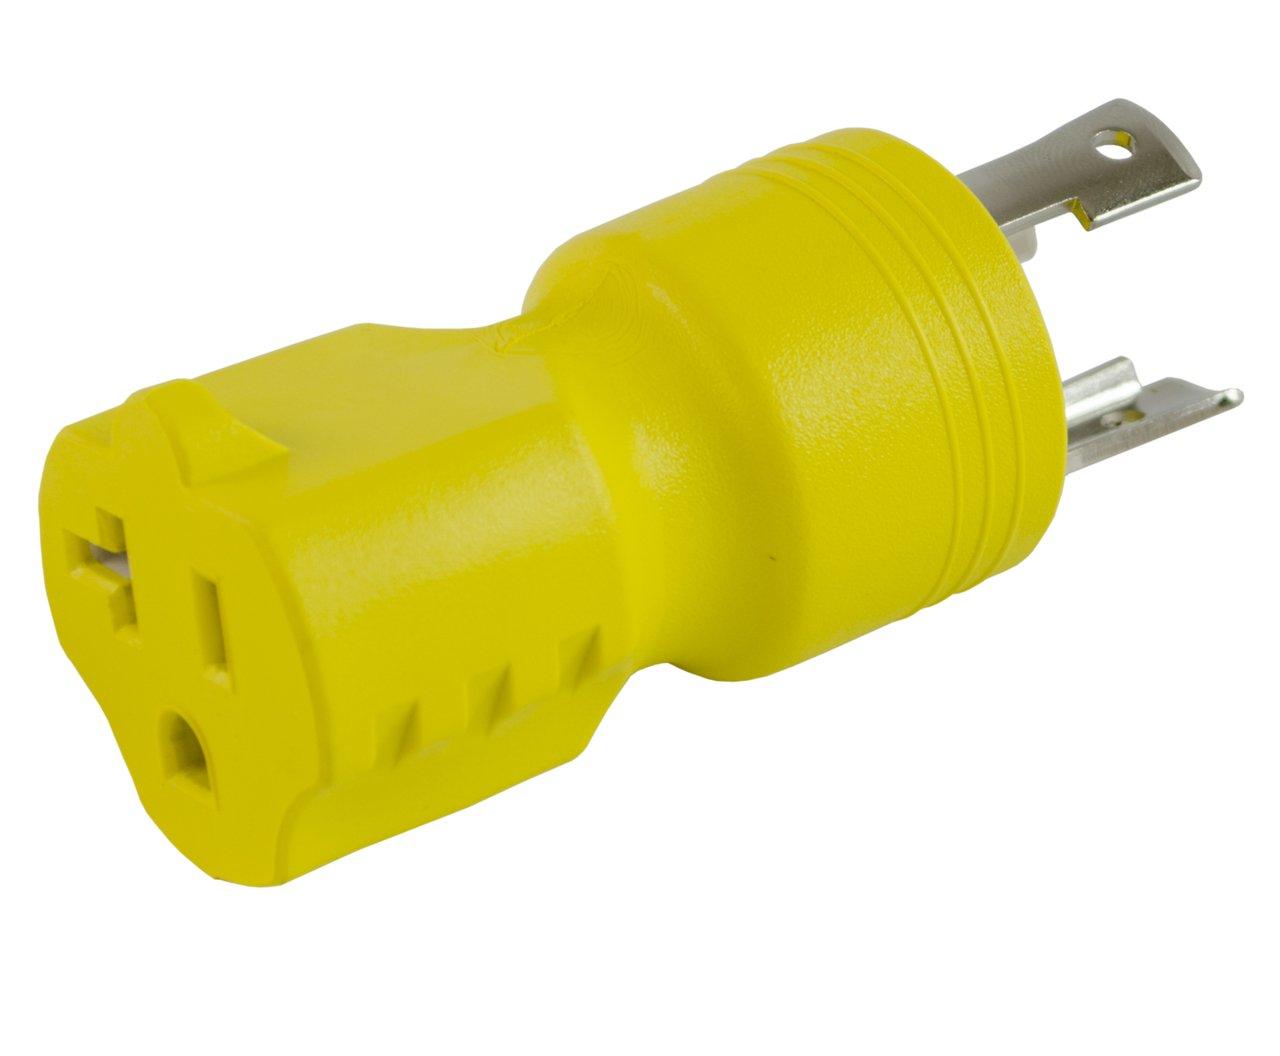 4 prong twist lock plug wiring diagram 4 image 50 amp twist lock plug wiring diagram jodebal com on 4 prong twist lock plug wiring